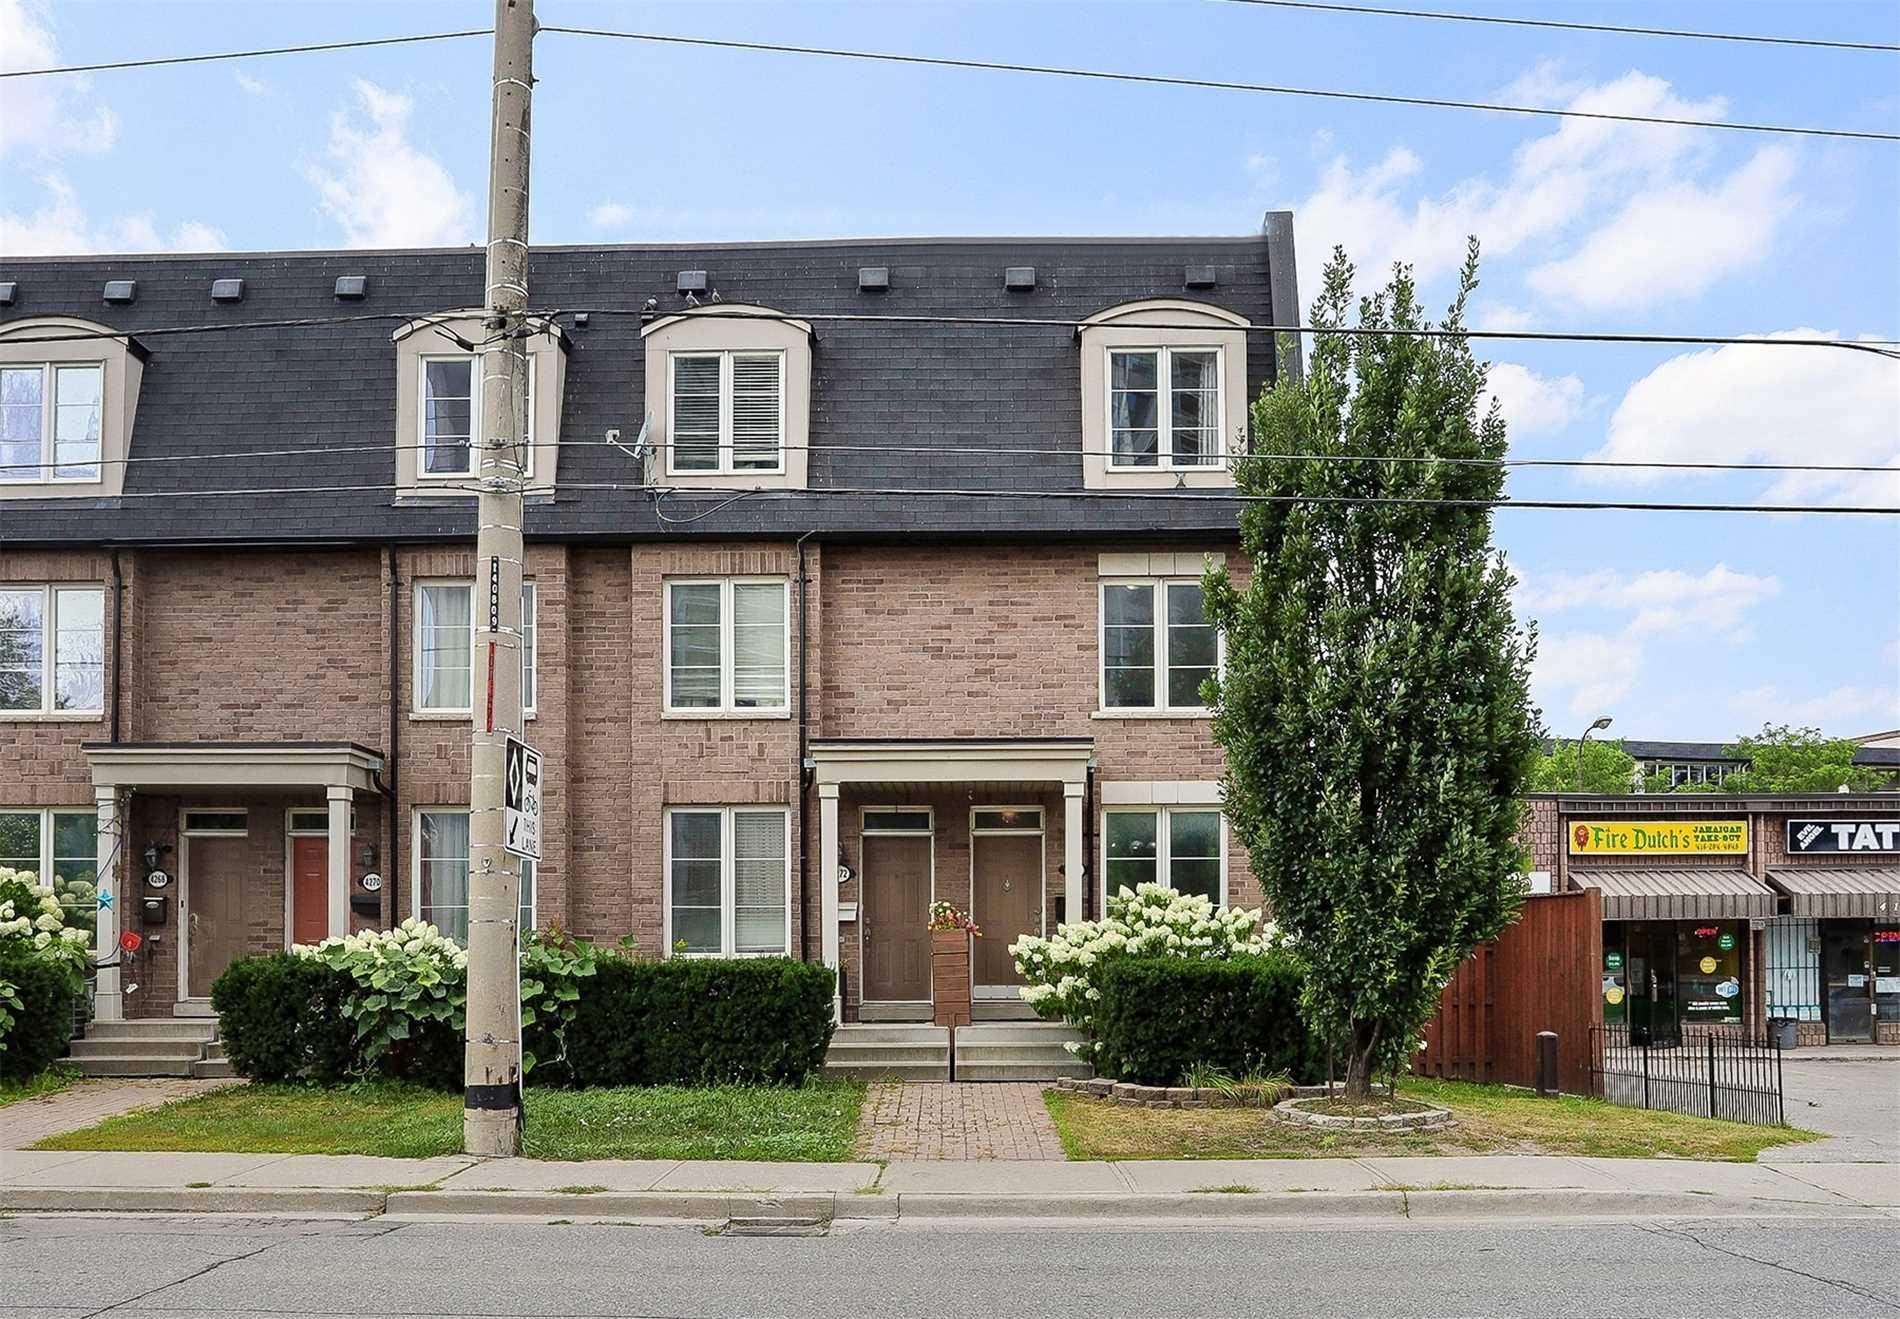 Att/row/twnhouse For Sale In Toronto , 4 Bedrooms Bedrooms, ,4 BathroomsBathrooms,Att/row/twnhouse,For Sale,Kingston